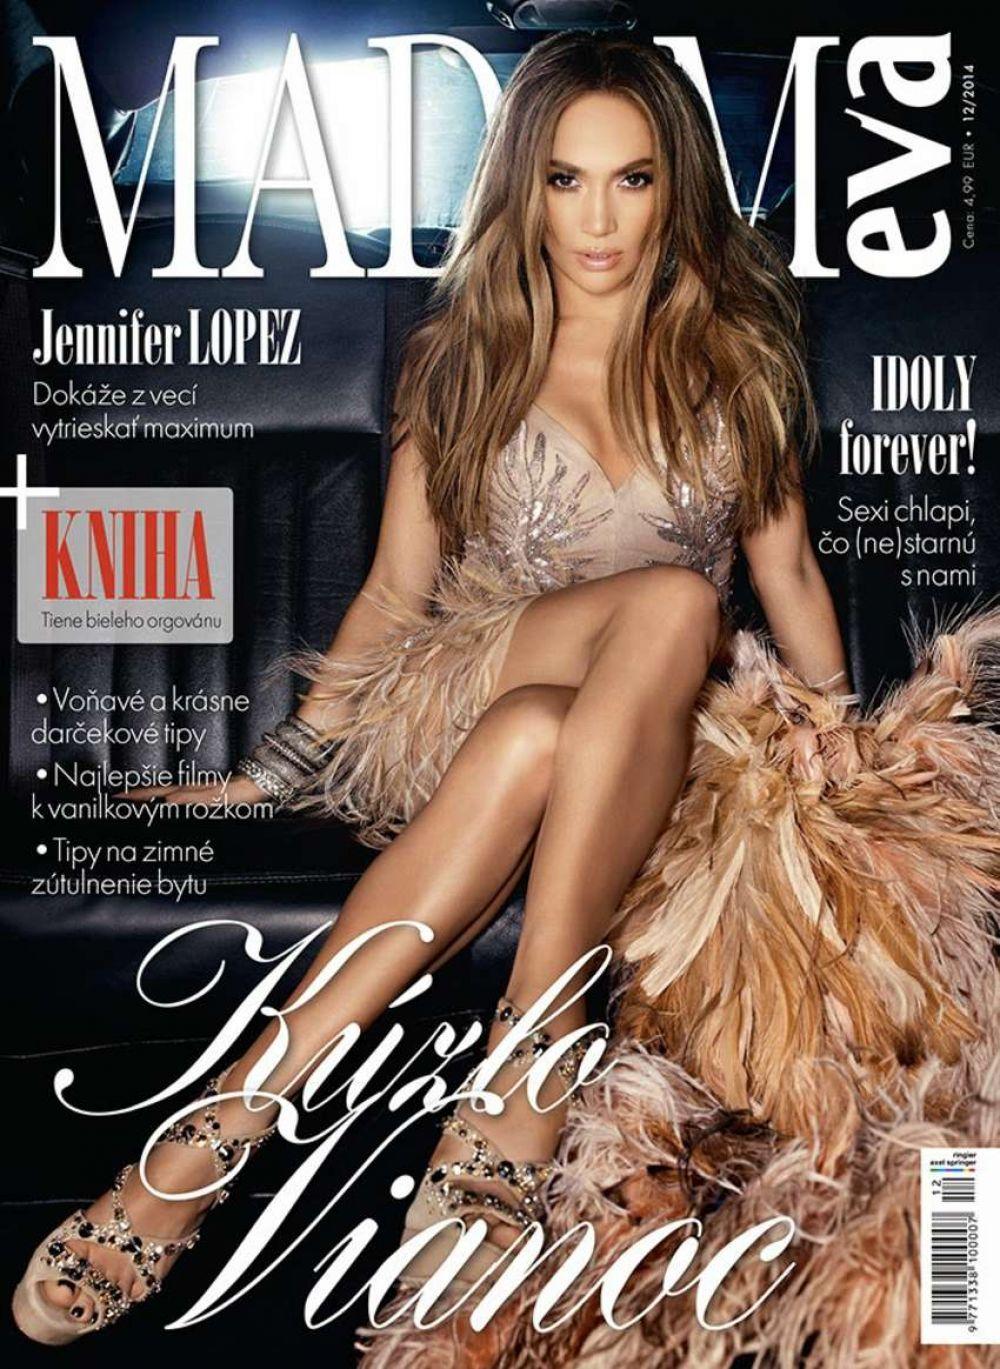 JENNIFER LOPEZ on the Cover of Madam Eva Magazine, December 2014 Issue